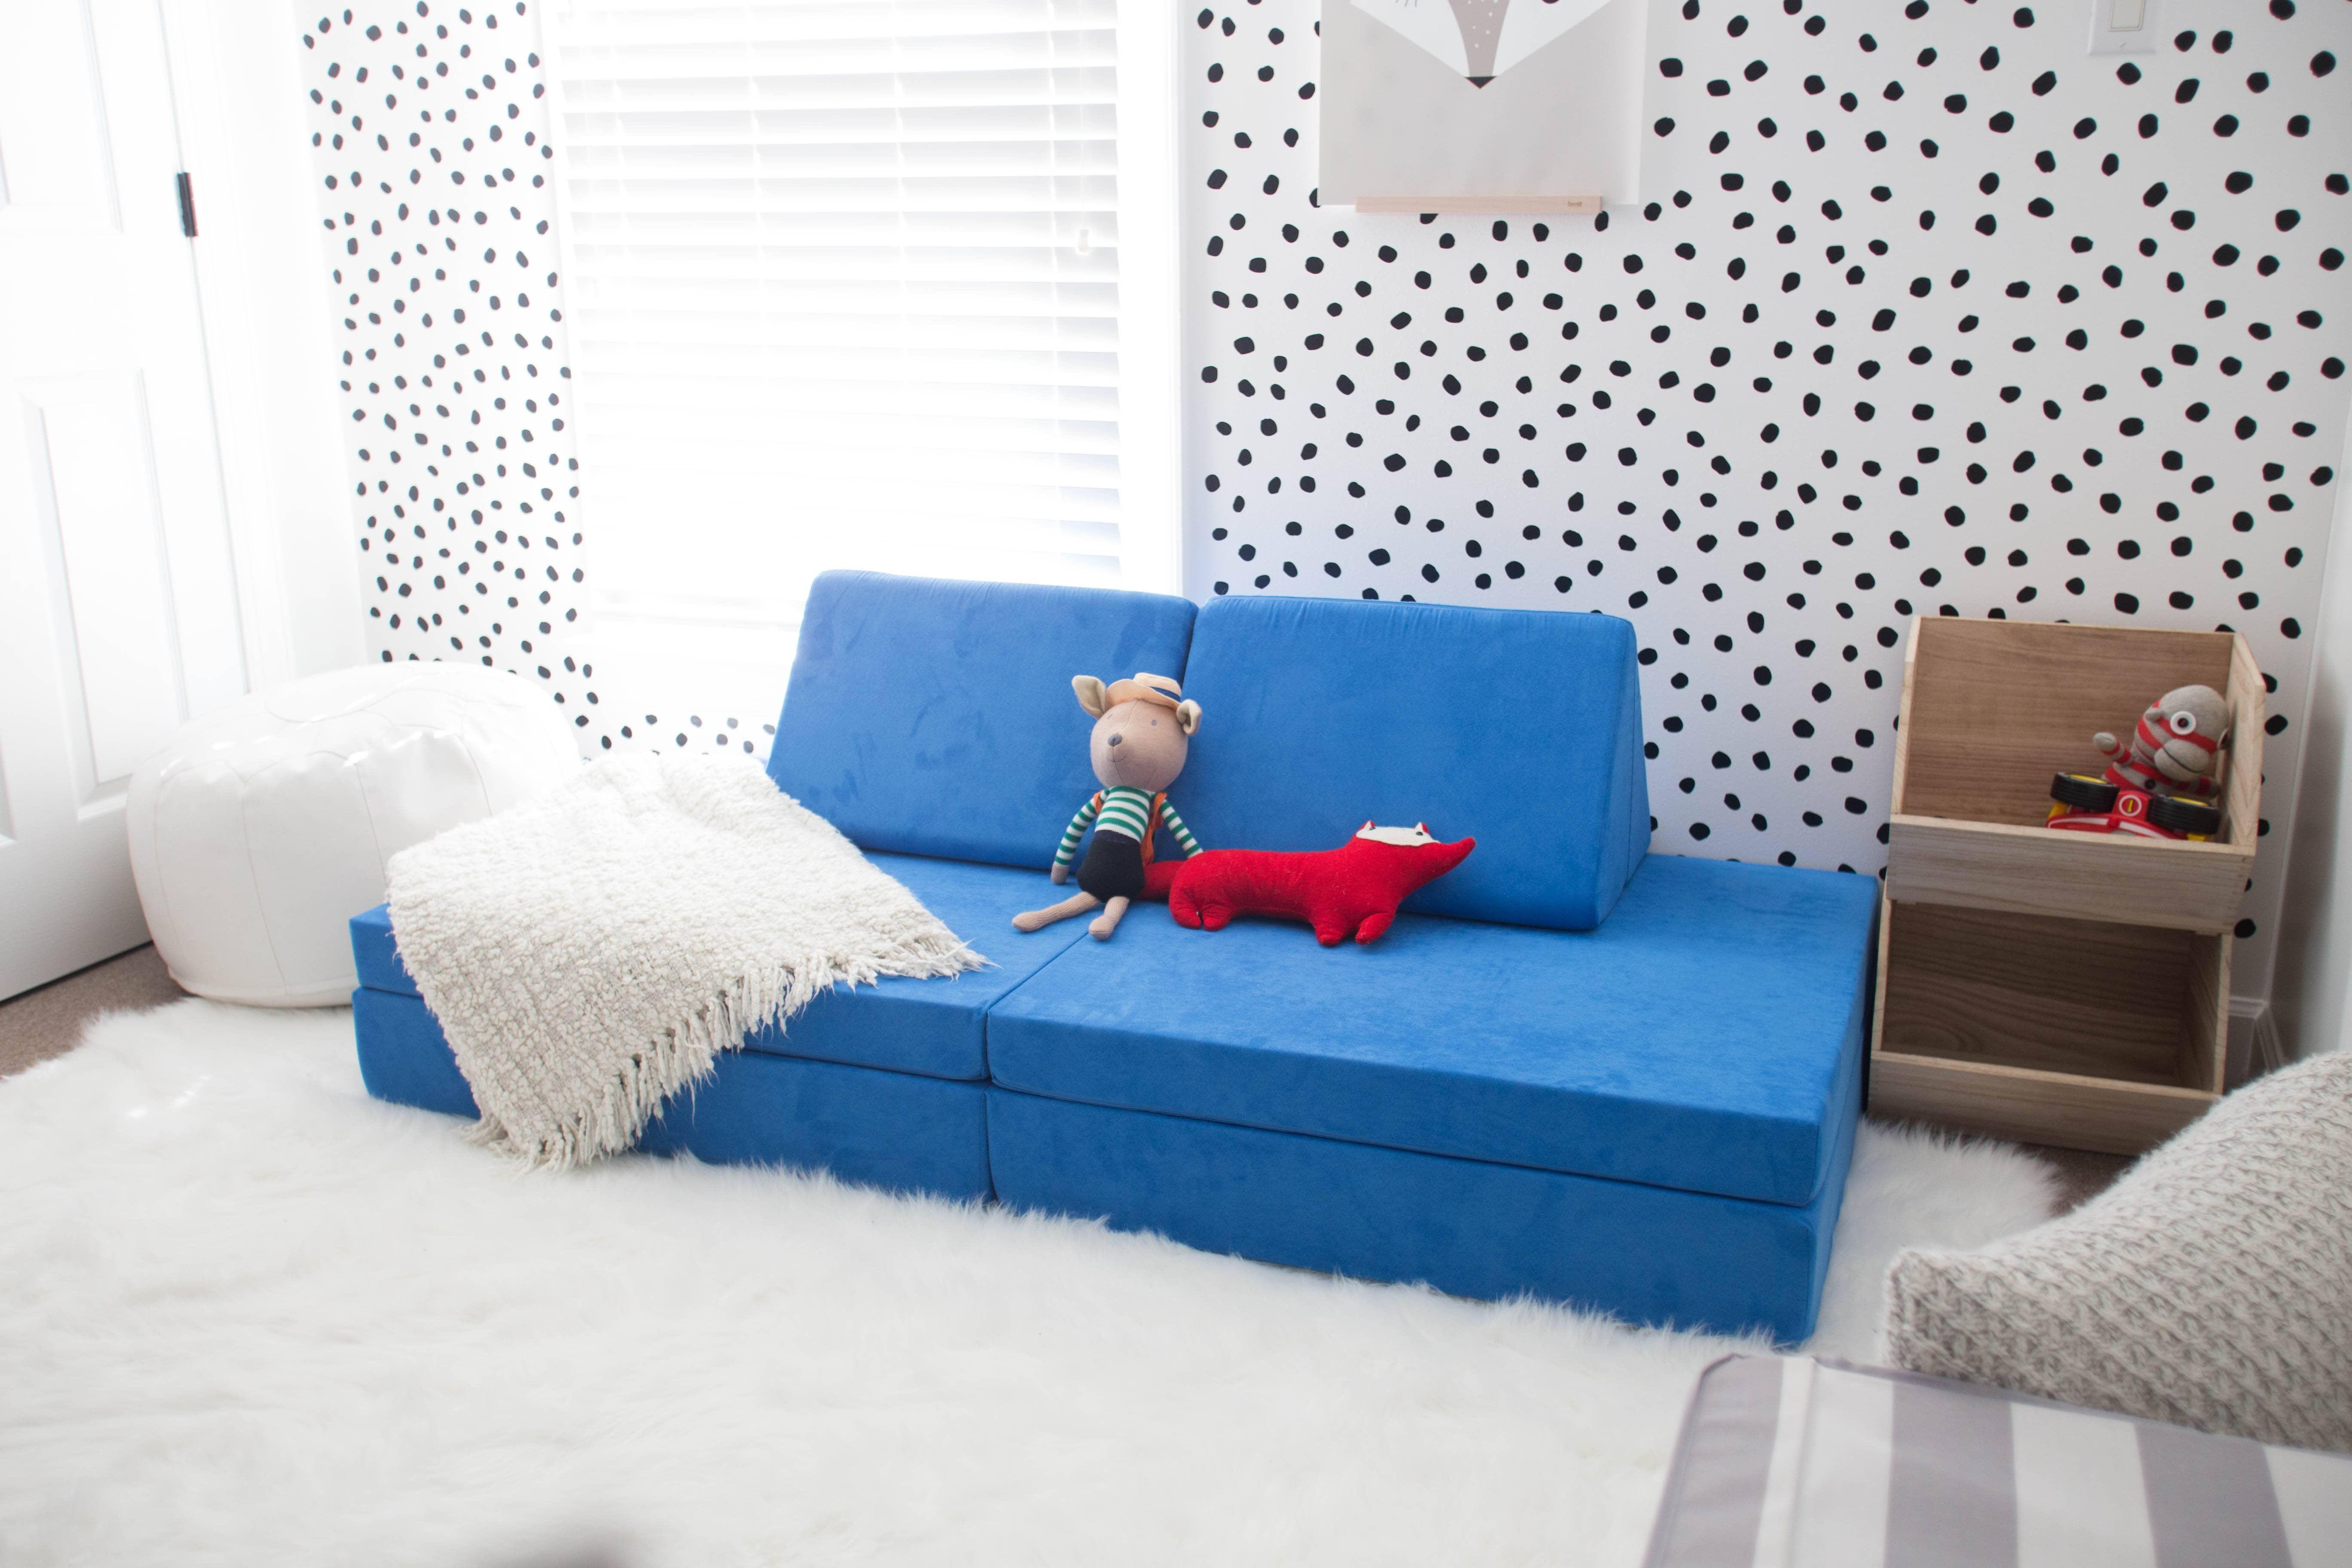 The Nugget - Koala / A calm, cool gray | Playroom ...